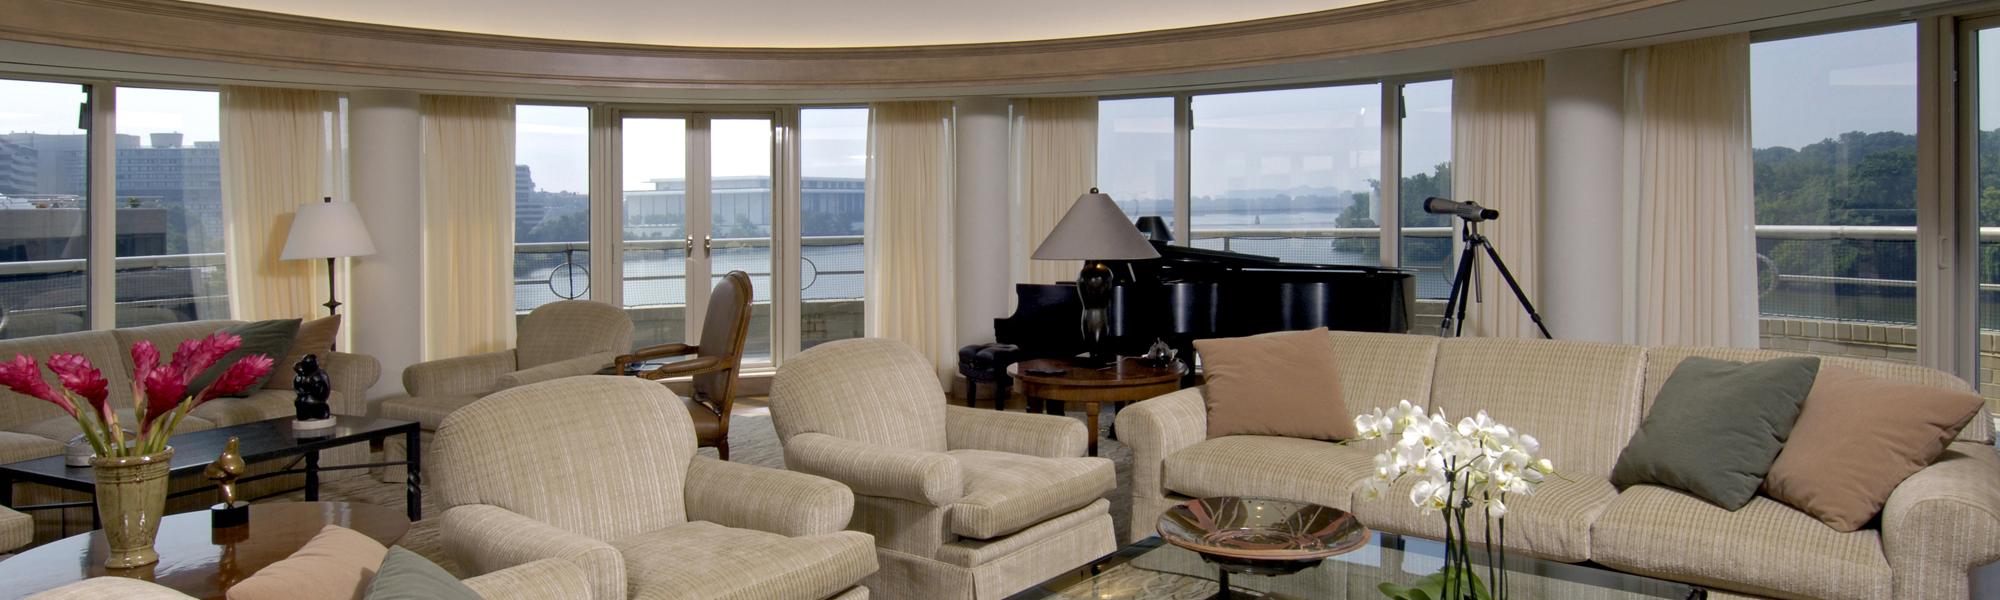 Condo Renovations | Luxury Condominium Remodeling | Luxury Renovations |  Design Build Experts | BOWA